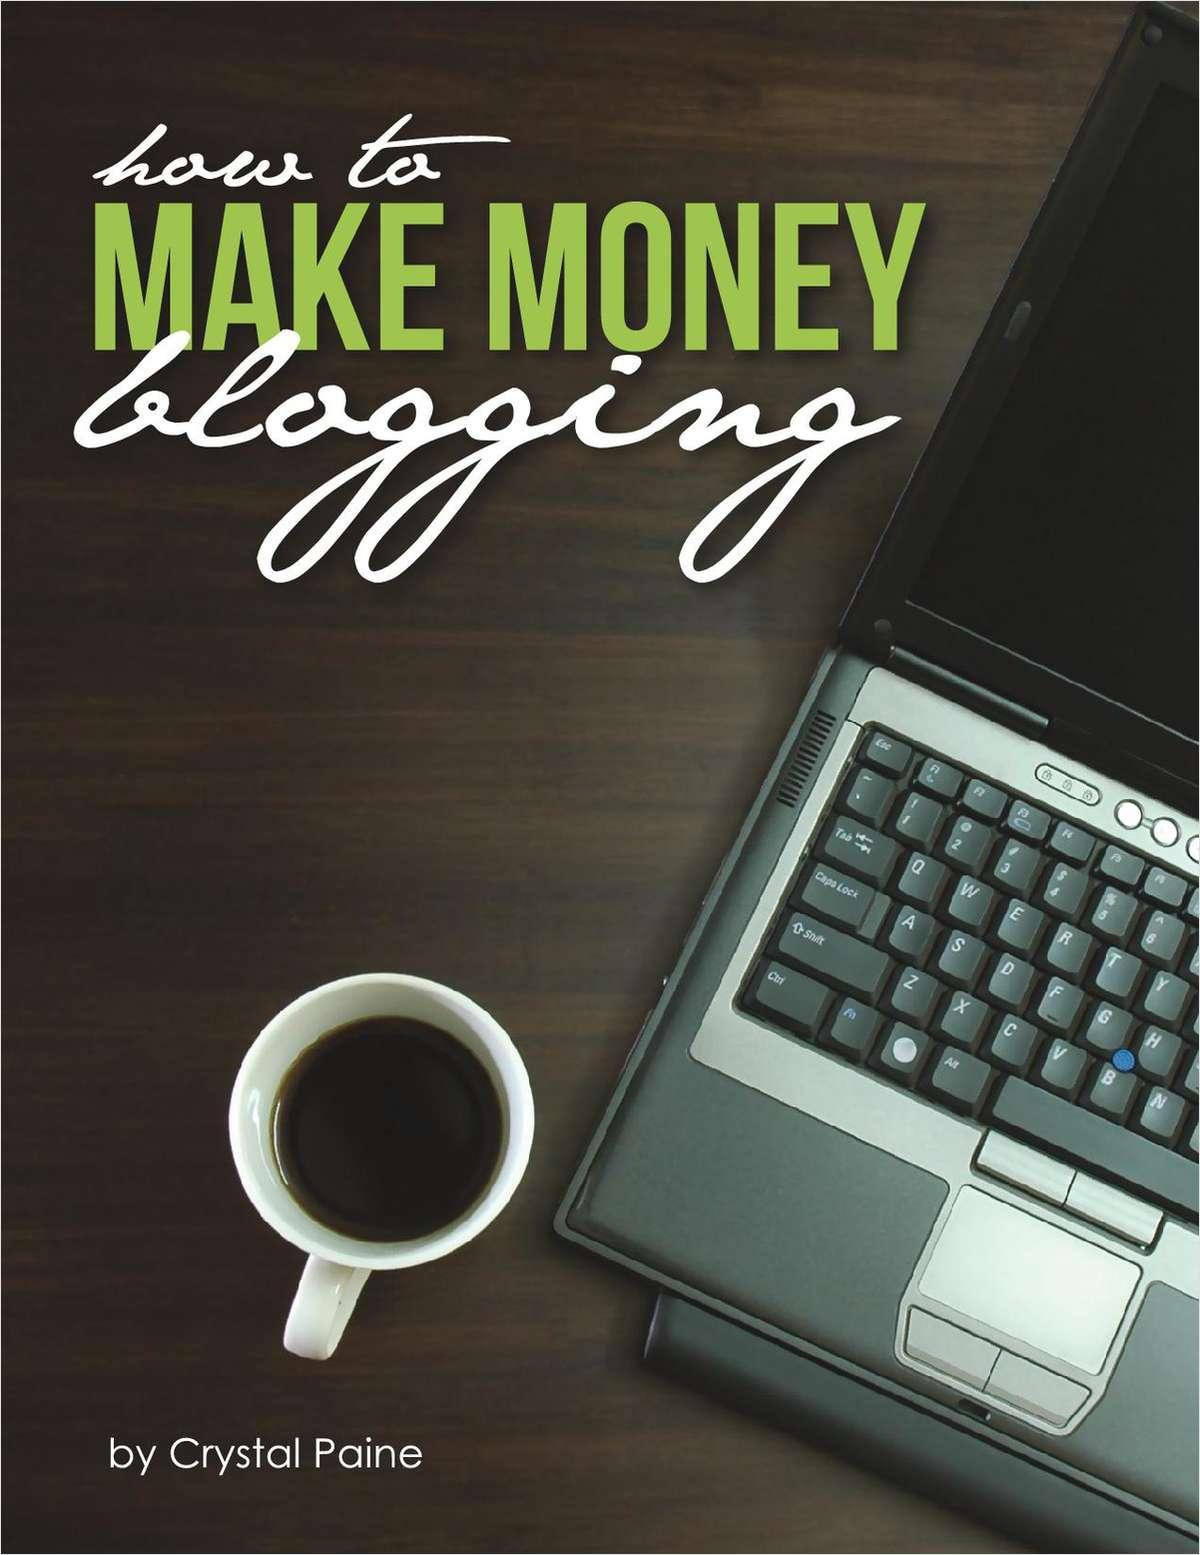 How to Make Money Blogging (Free eBook!)